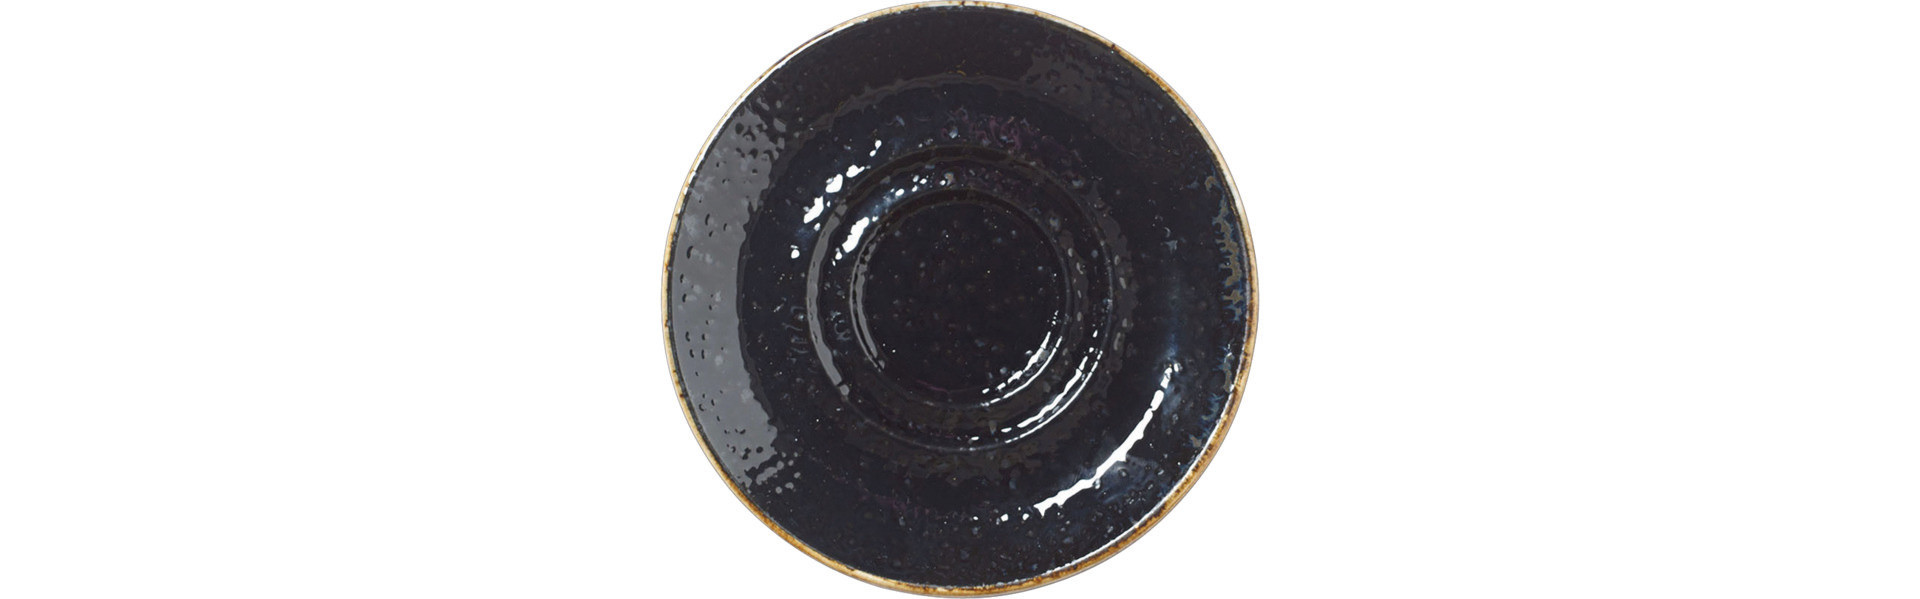 Craft Liquorice, Espresso-Untertasse ø 118 mm